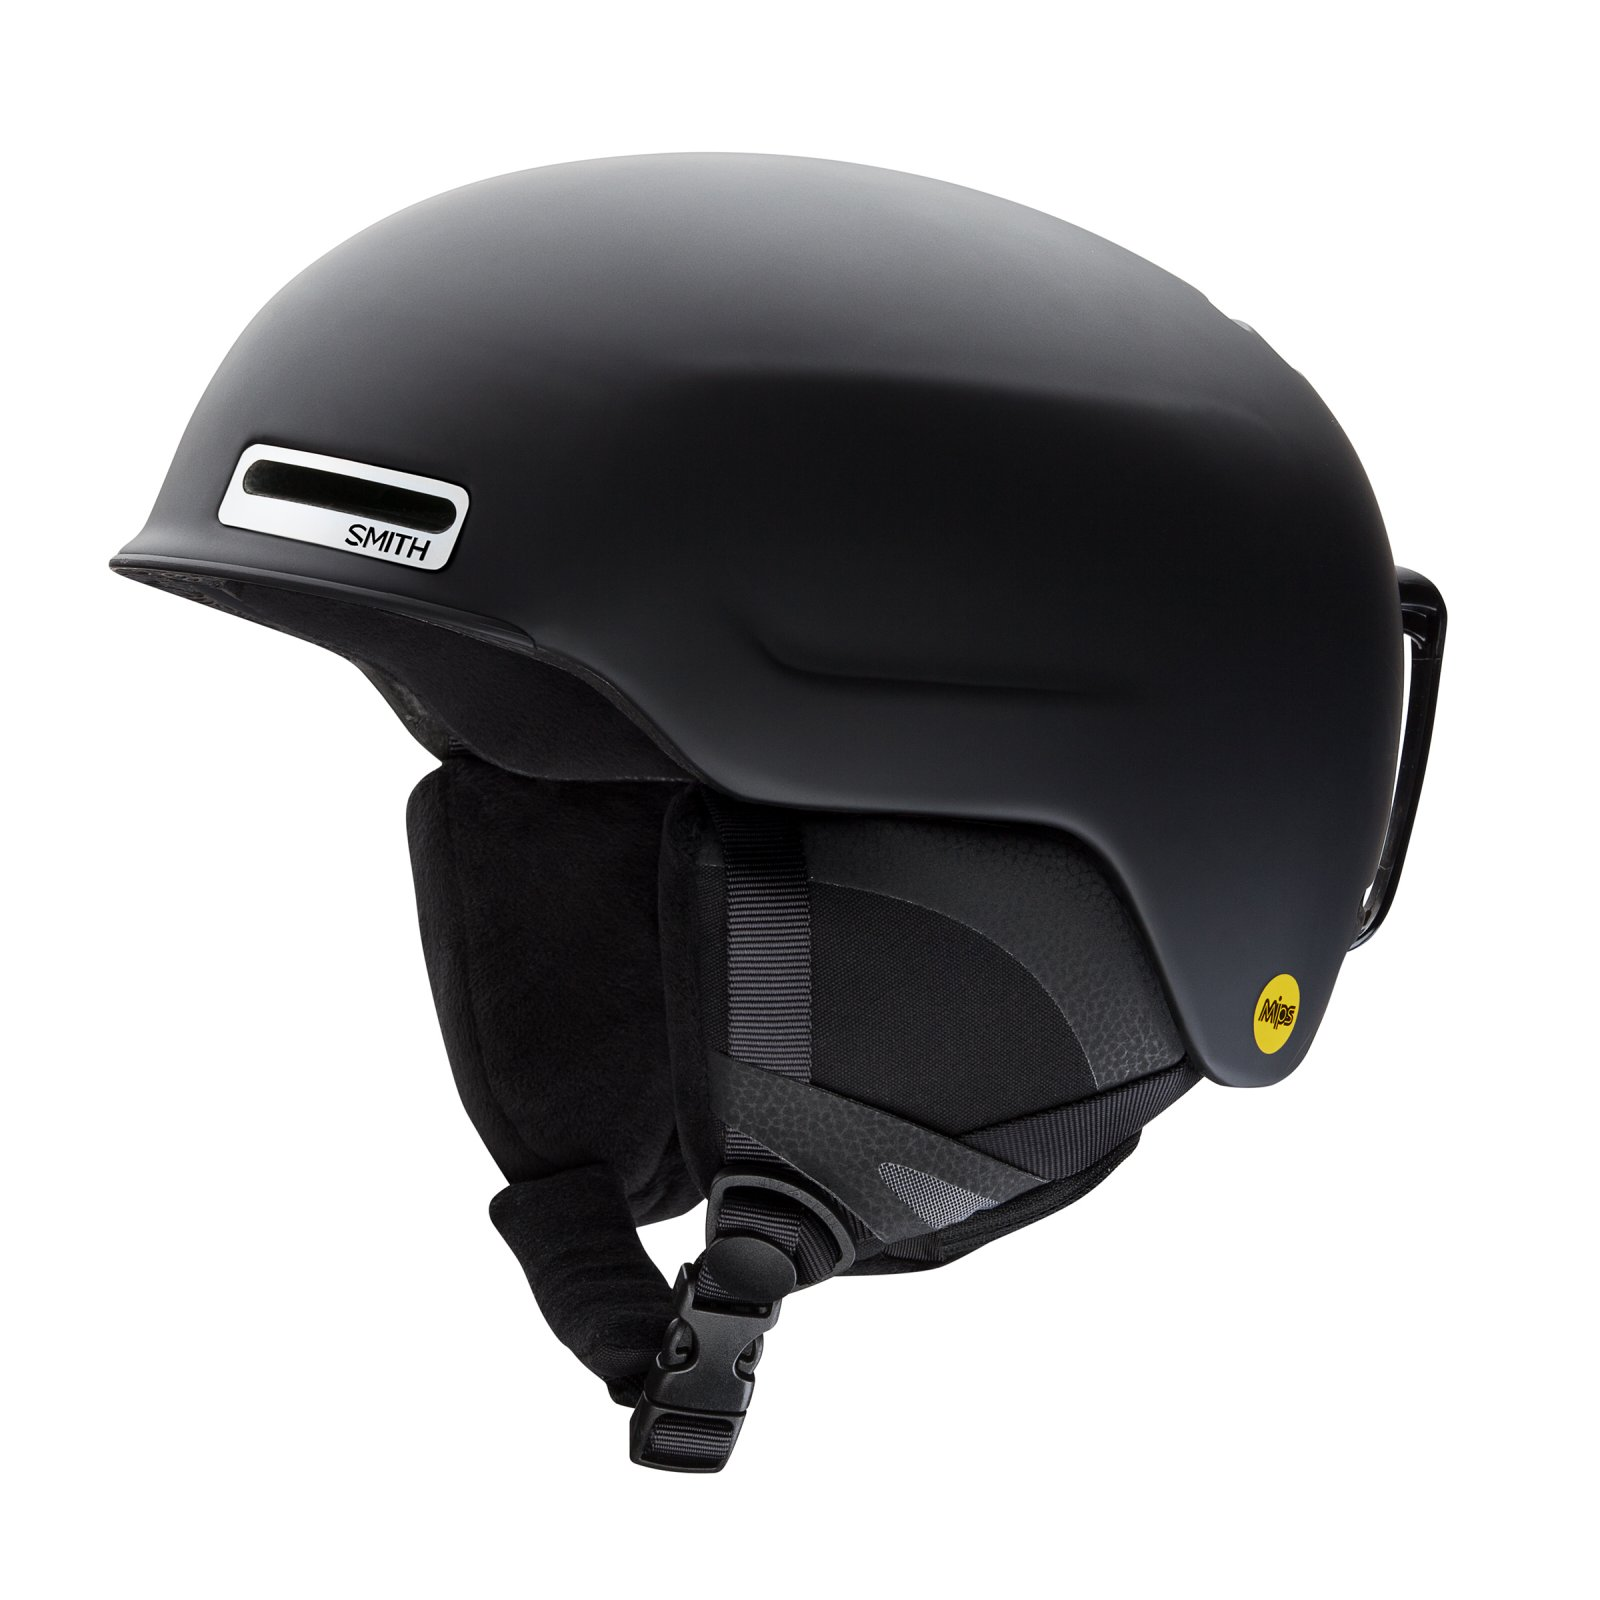 2022 Smith Maze MIPS Helmet